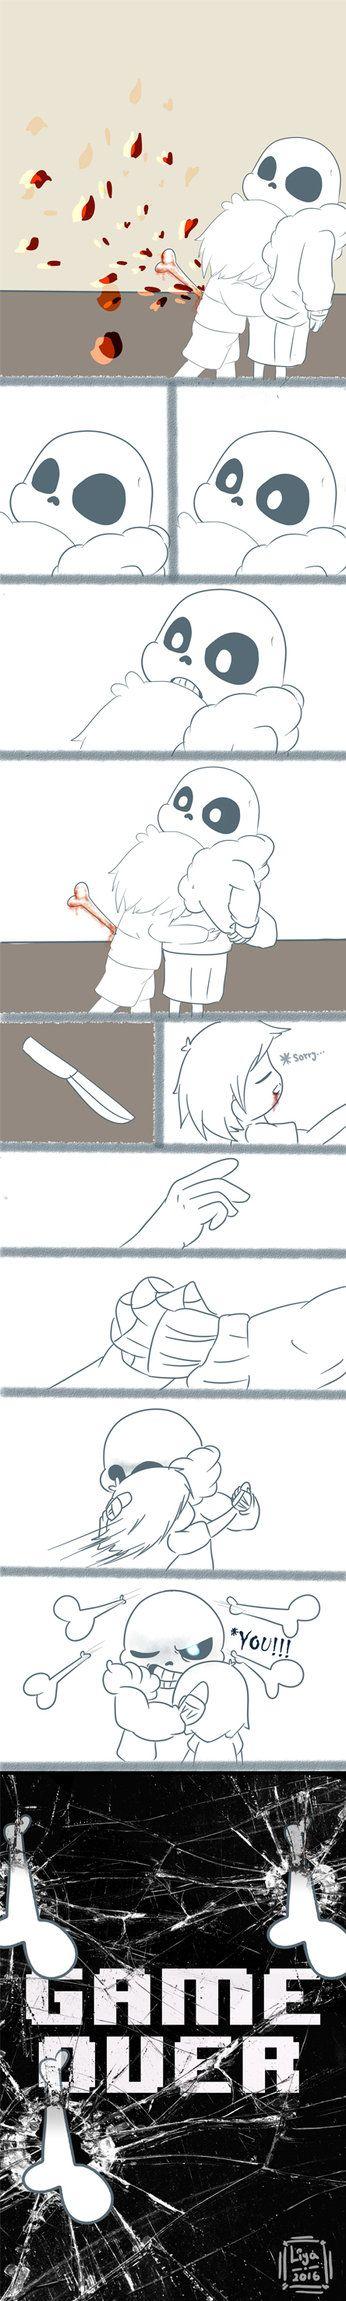 [Comic] Undertale - You! (part 2/2) by janis-roxas.deviantart.com on @DeviantArt